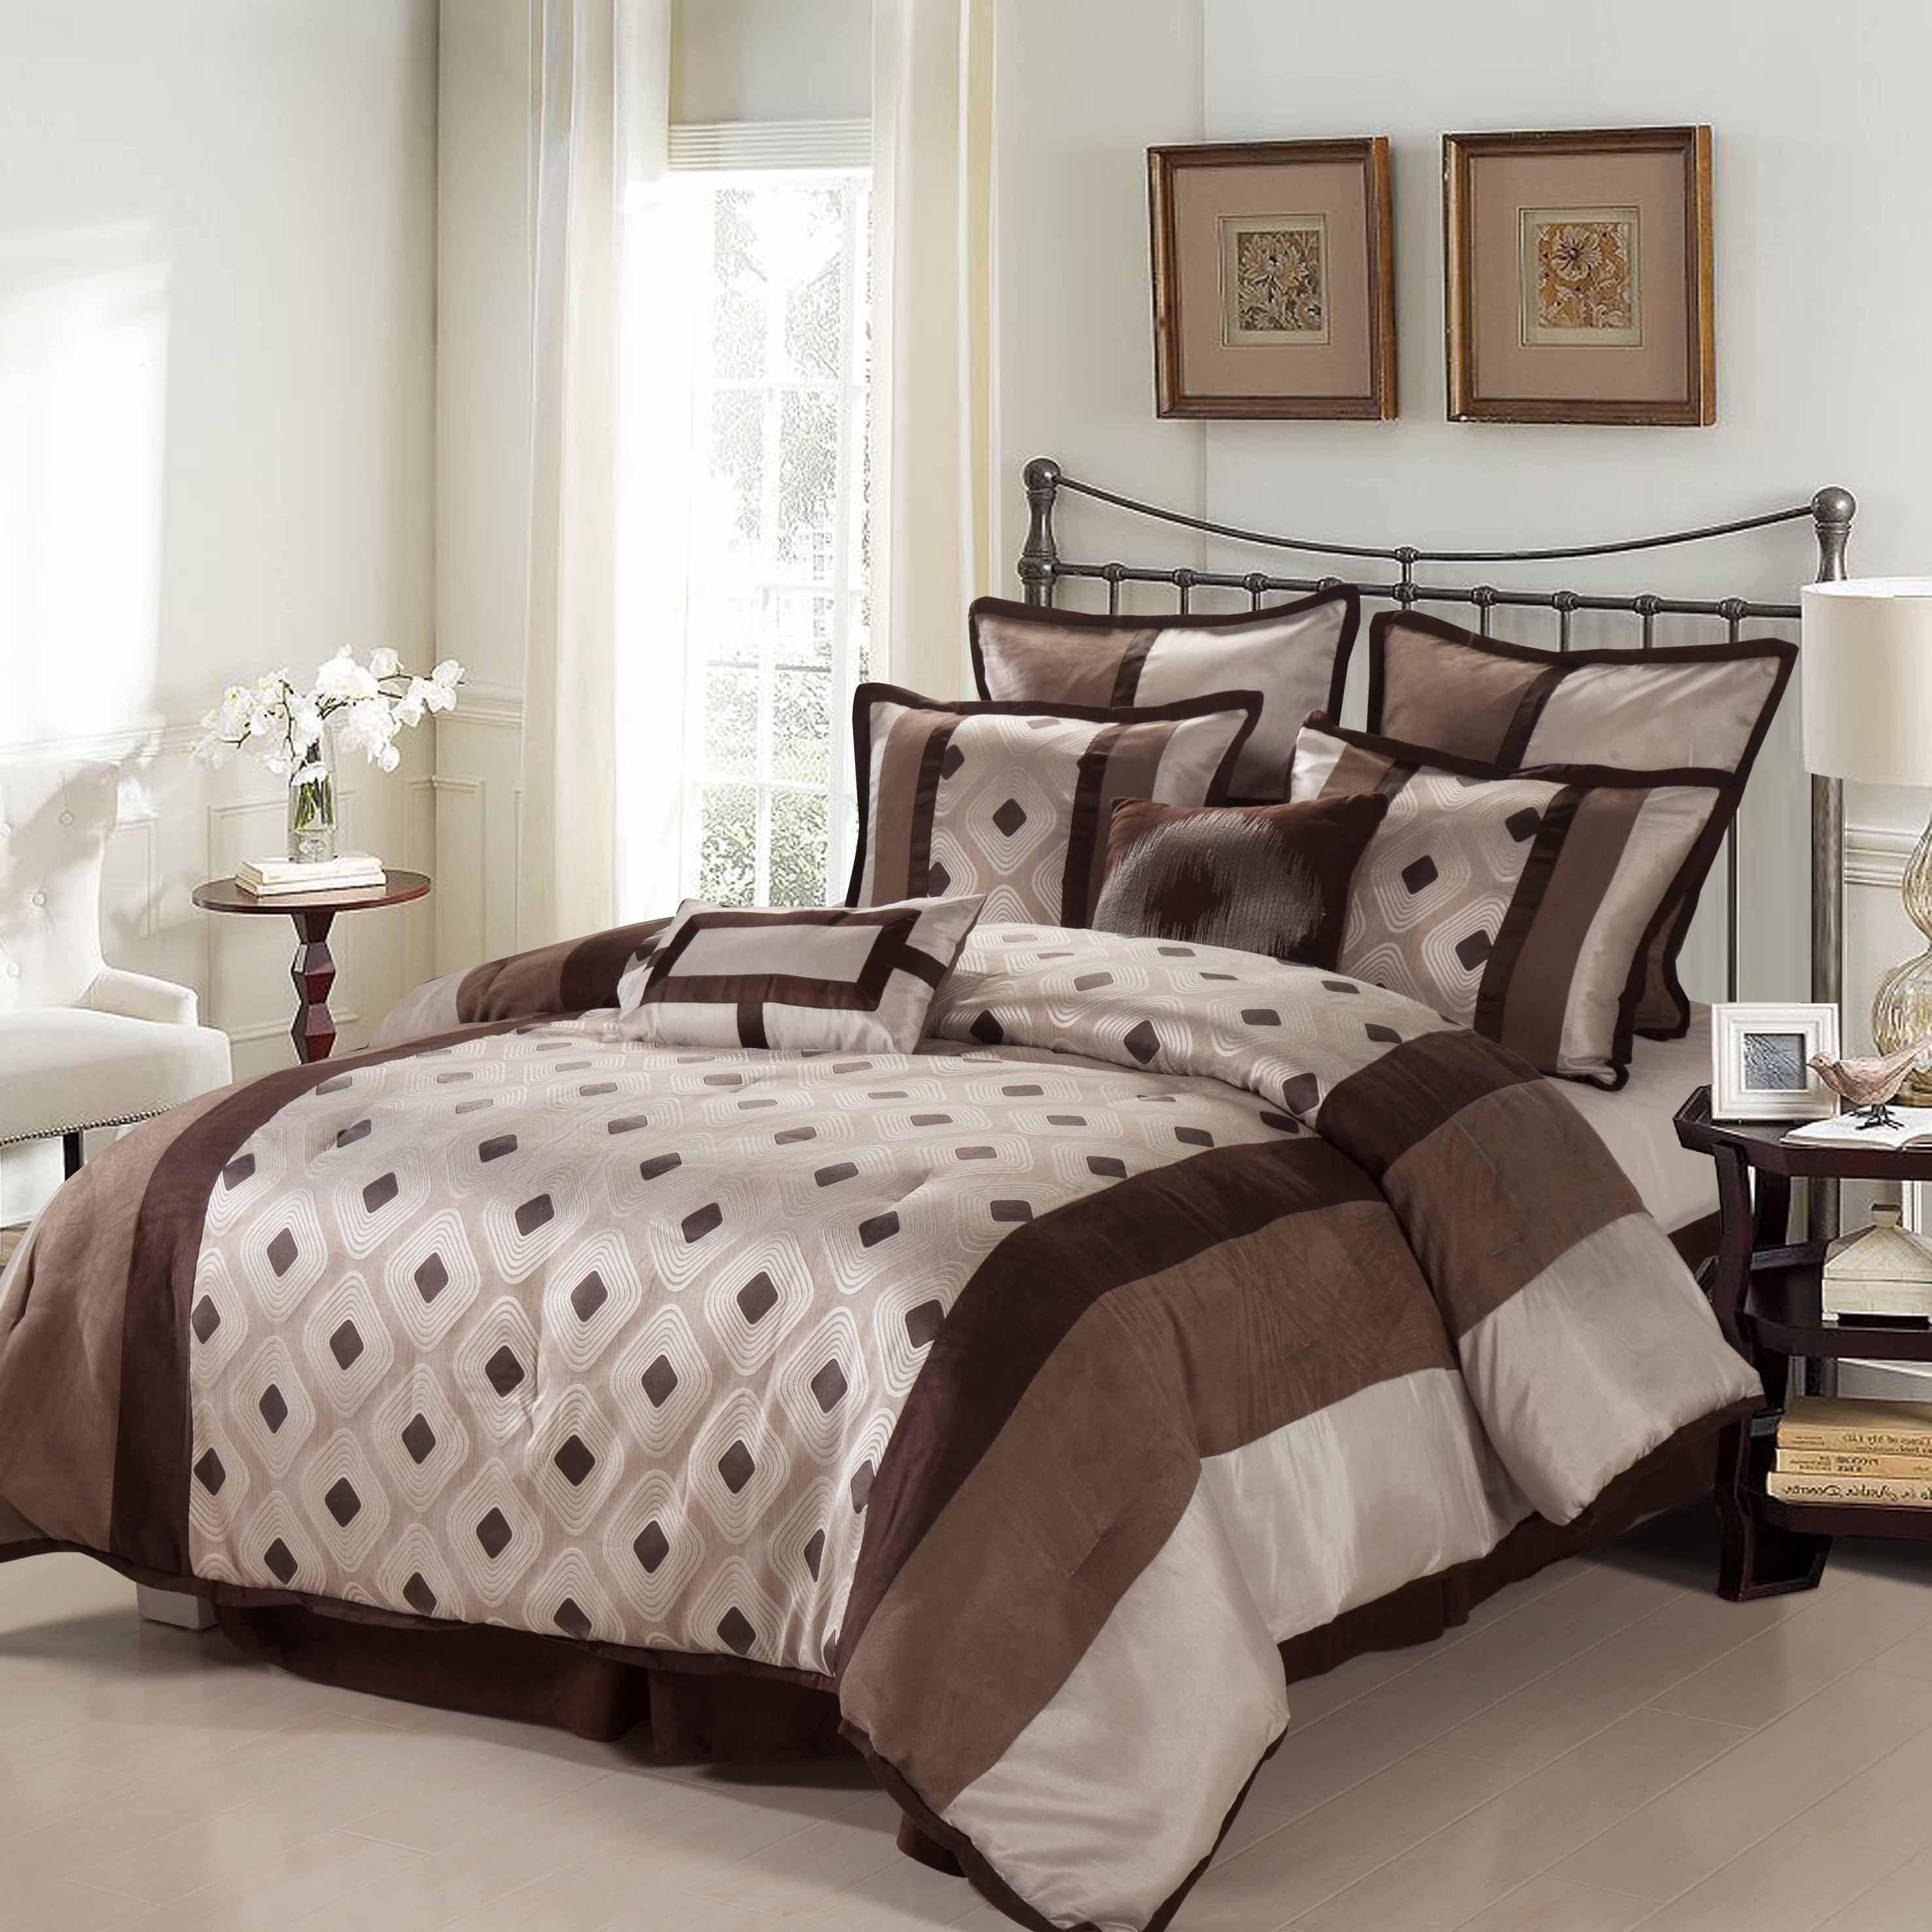 Nanshing Grayson 8-Piece Reversible Comforter Set